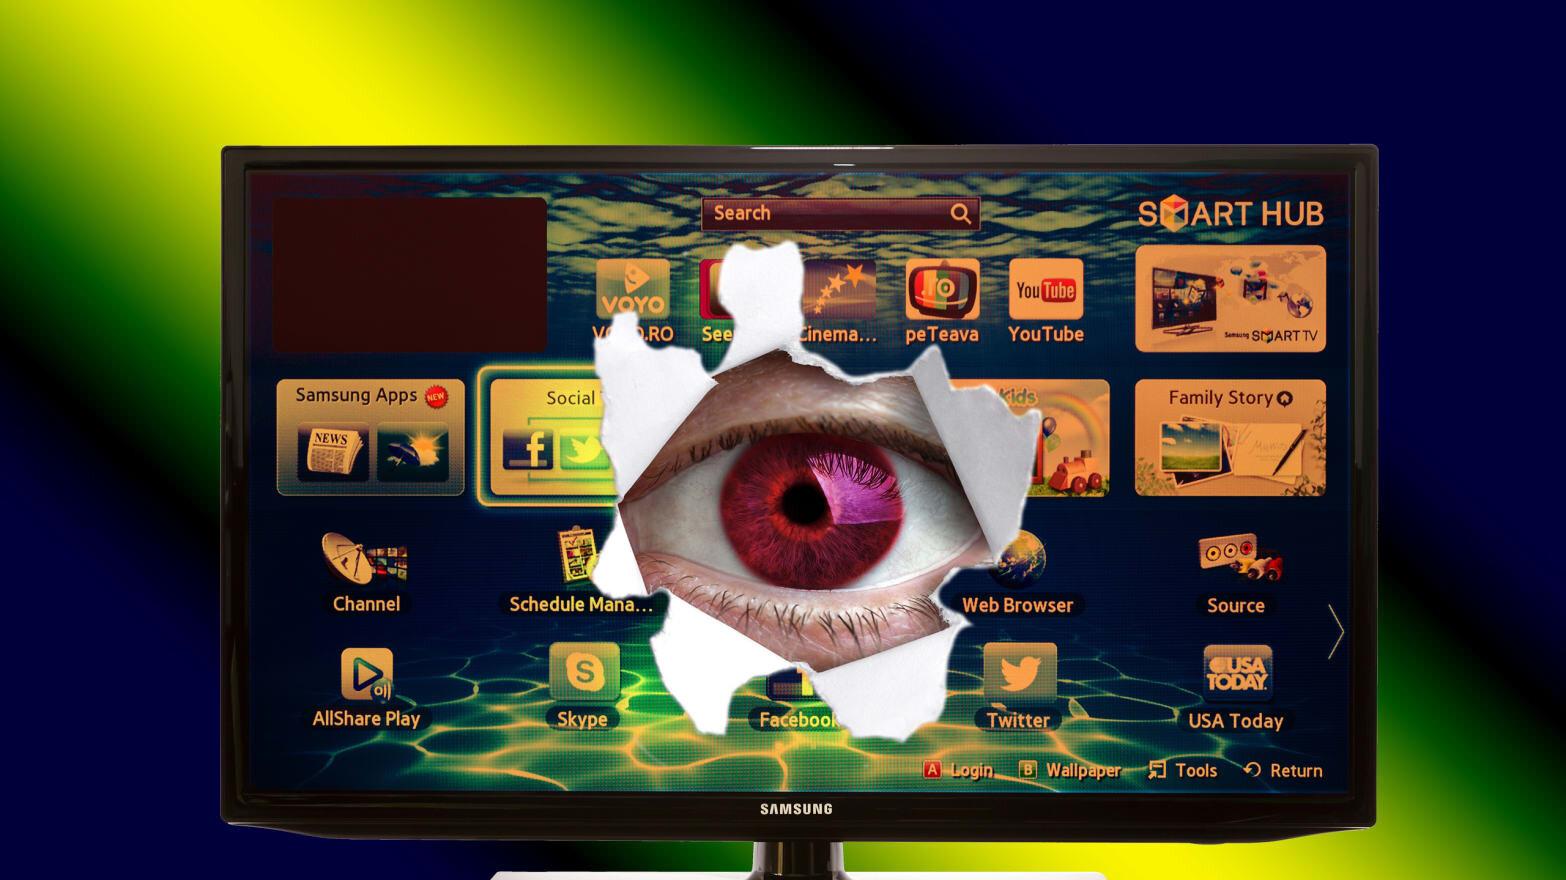 150205-harris-samsung-tv-spy-tease_lxq7jr.jpg